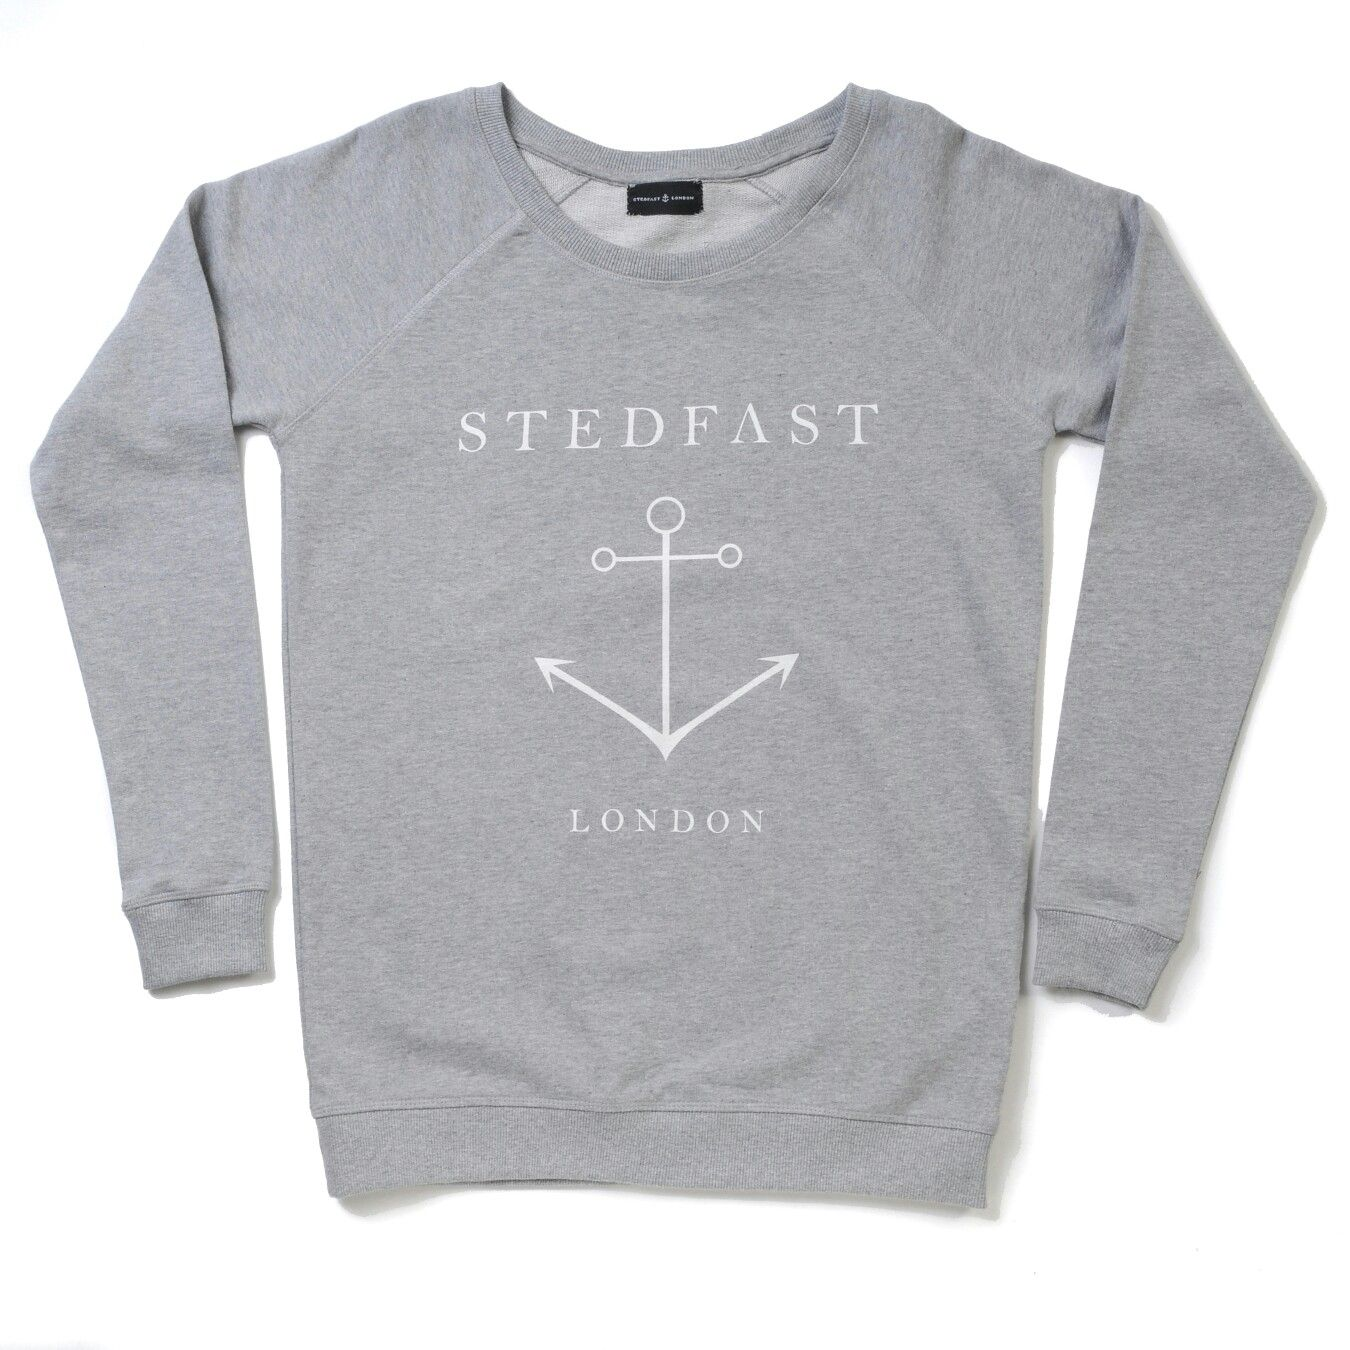 Stedfast London grey anchor sweatshirt woman